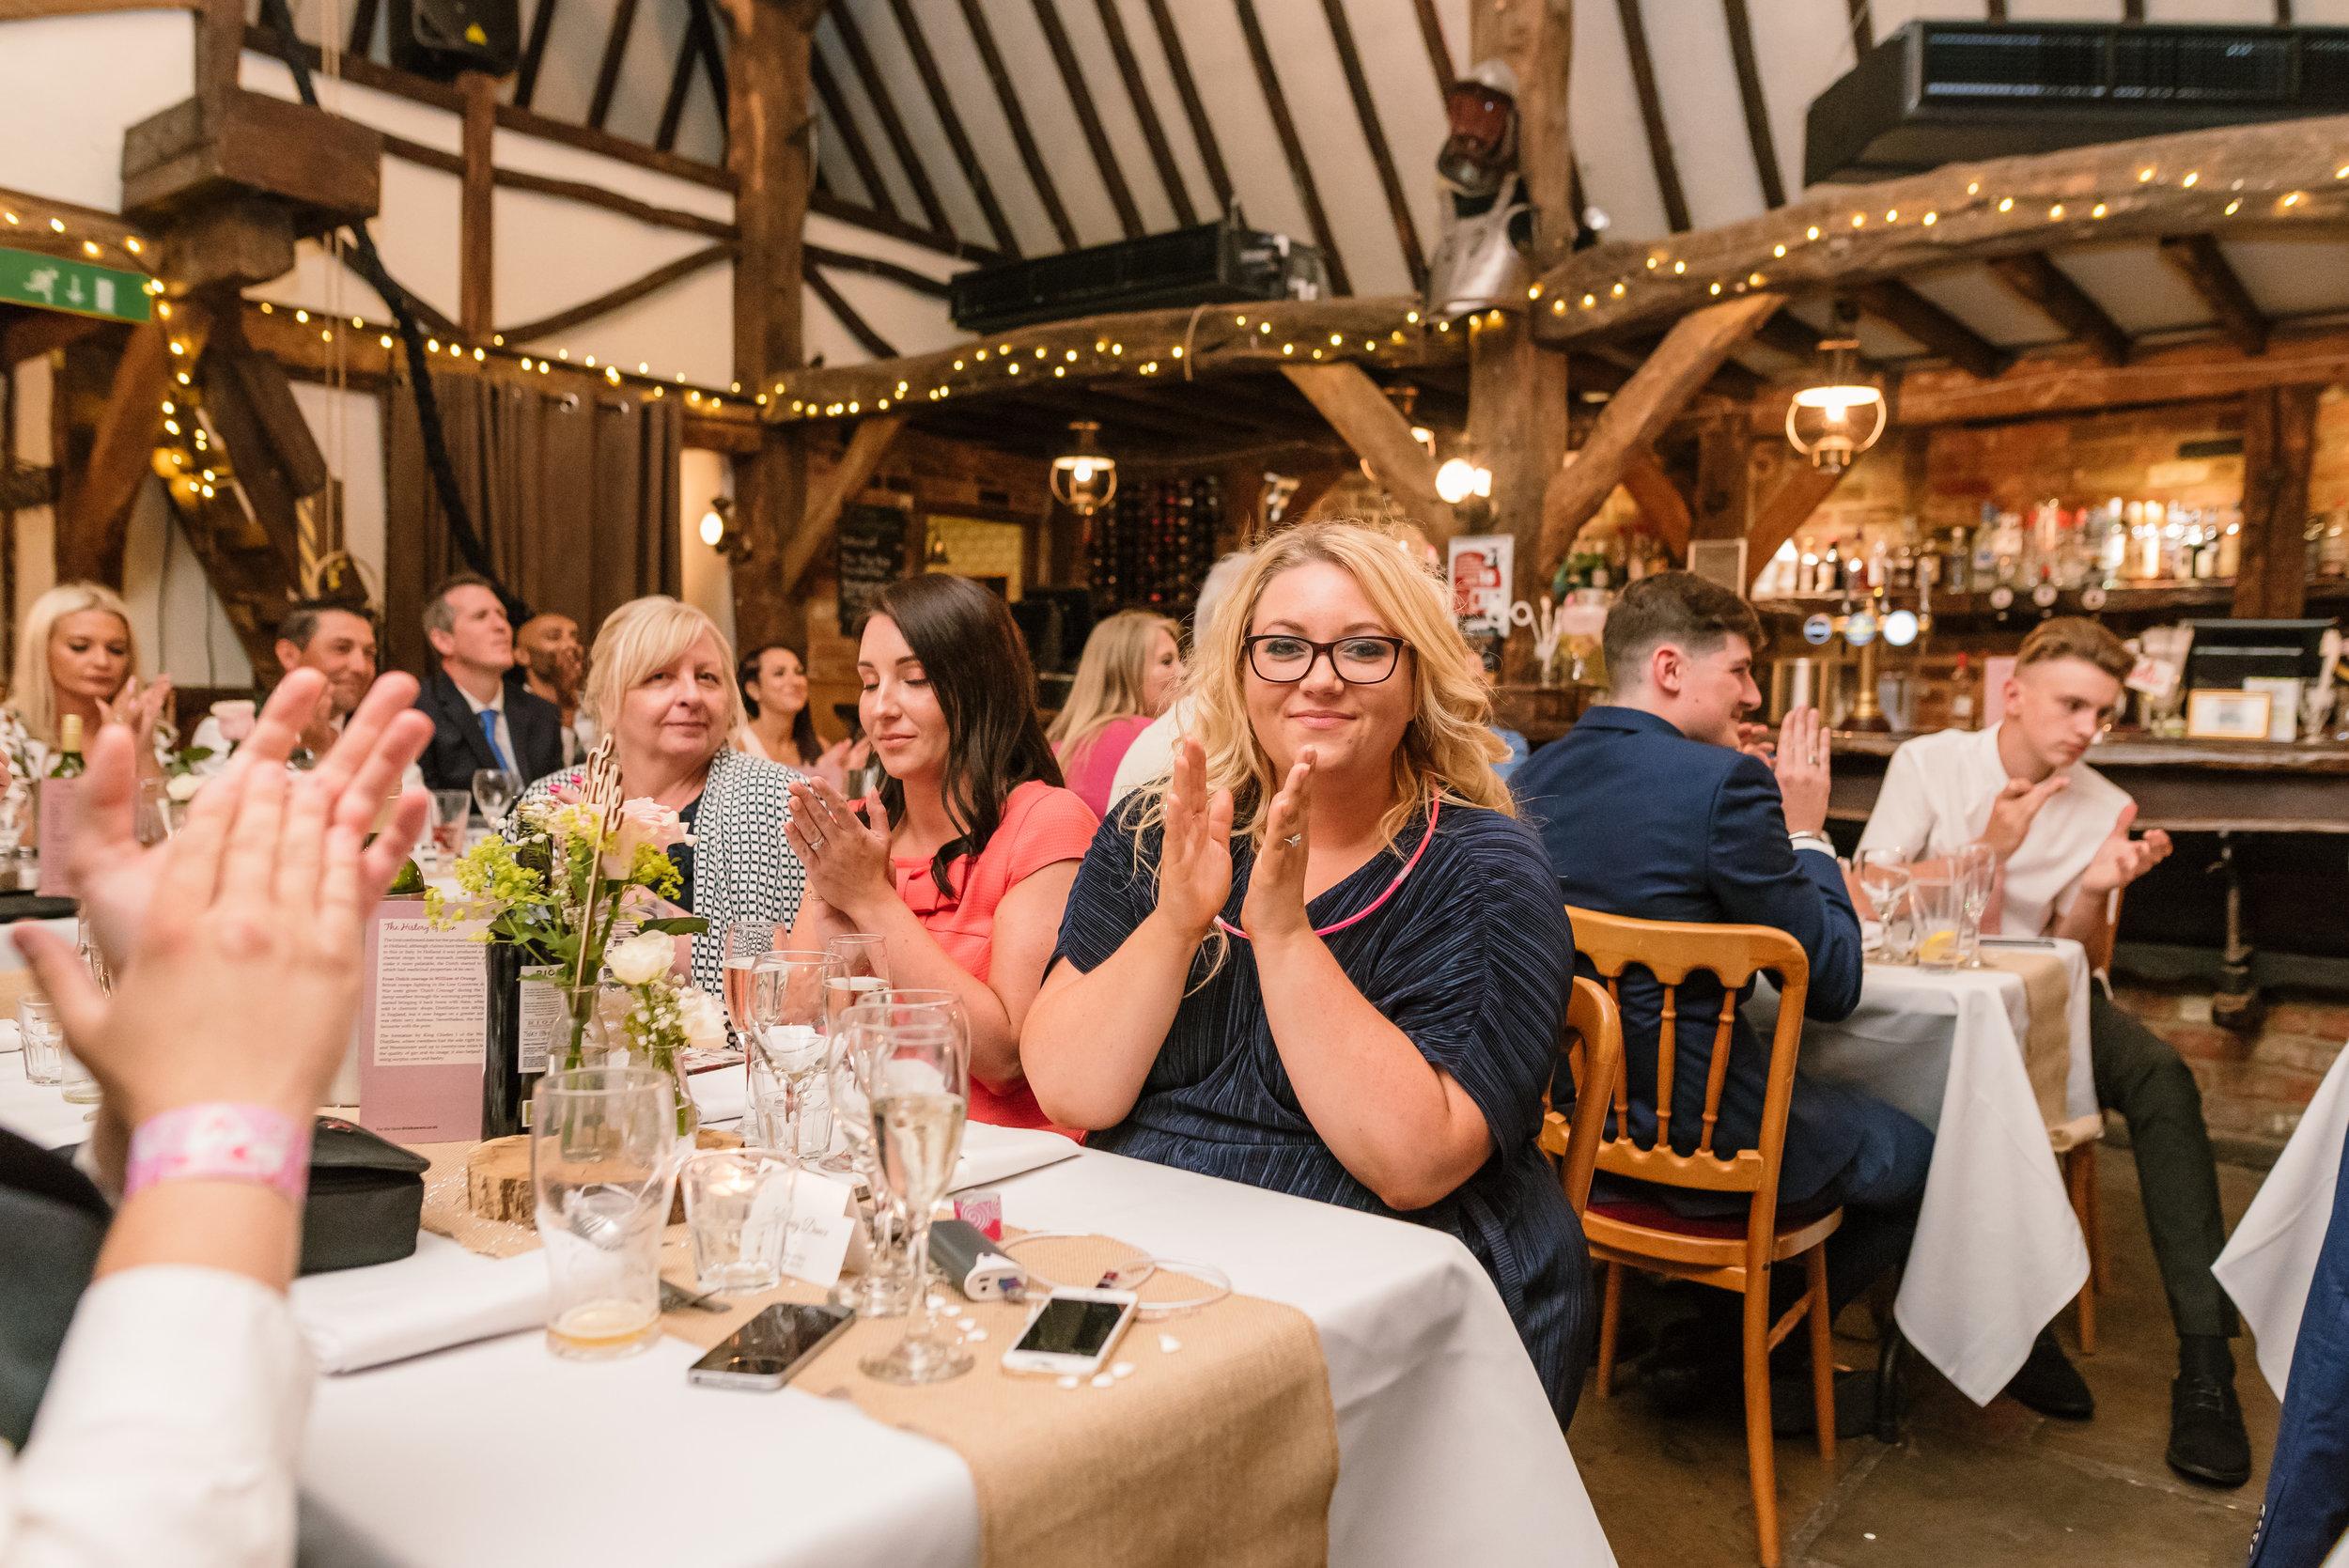 Sarah-Fishlock-Photography : Hampshire-wedding-photographer-hampshire : fleet-wedding-photographer-fleet : Meade-Hall-Wedding-Photographer : Meade-Hall-Wedding-Photos-822.jpg